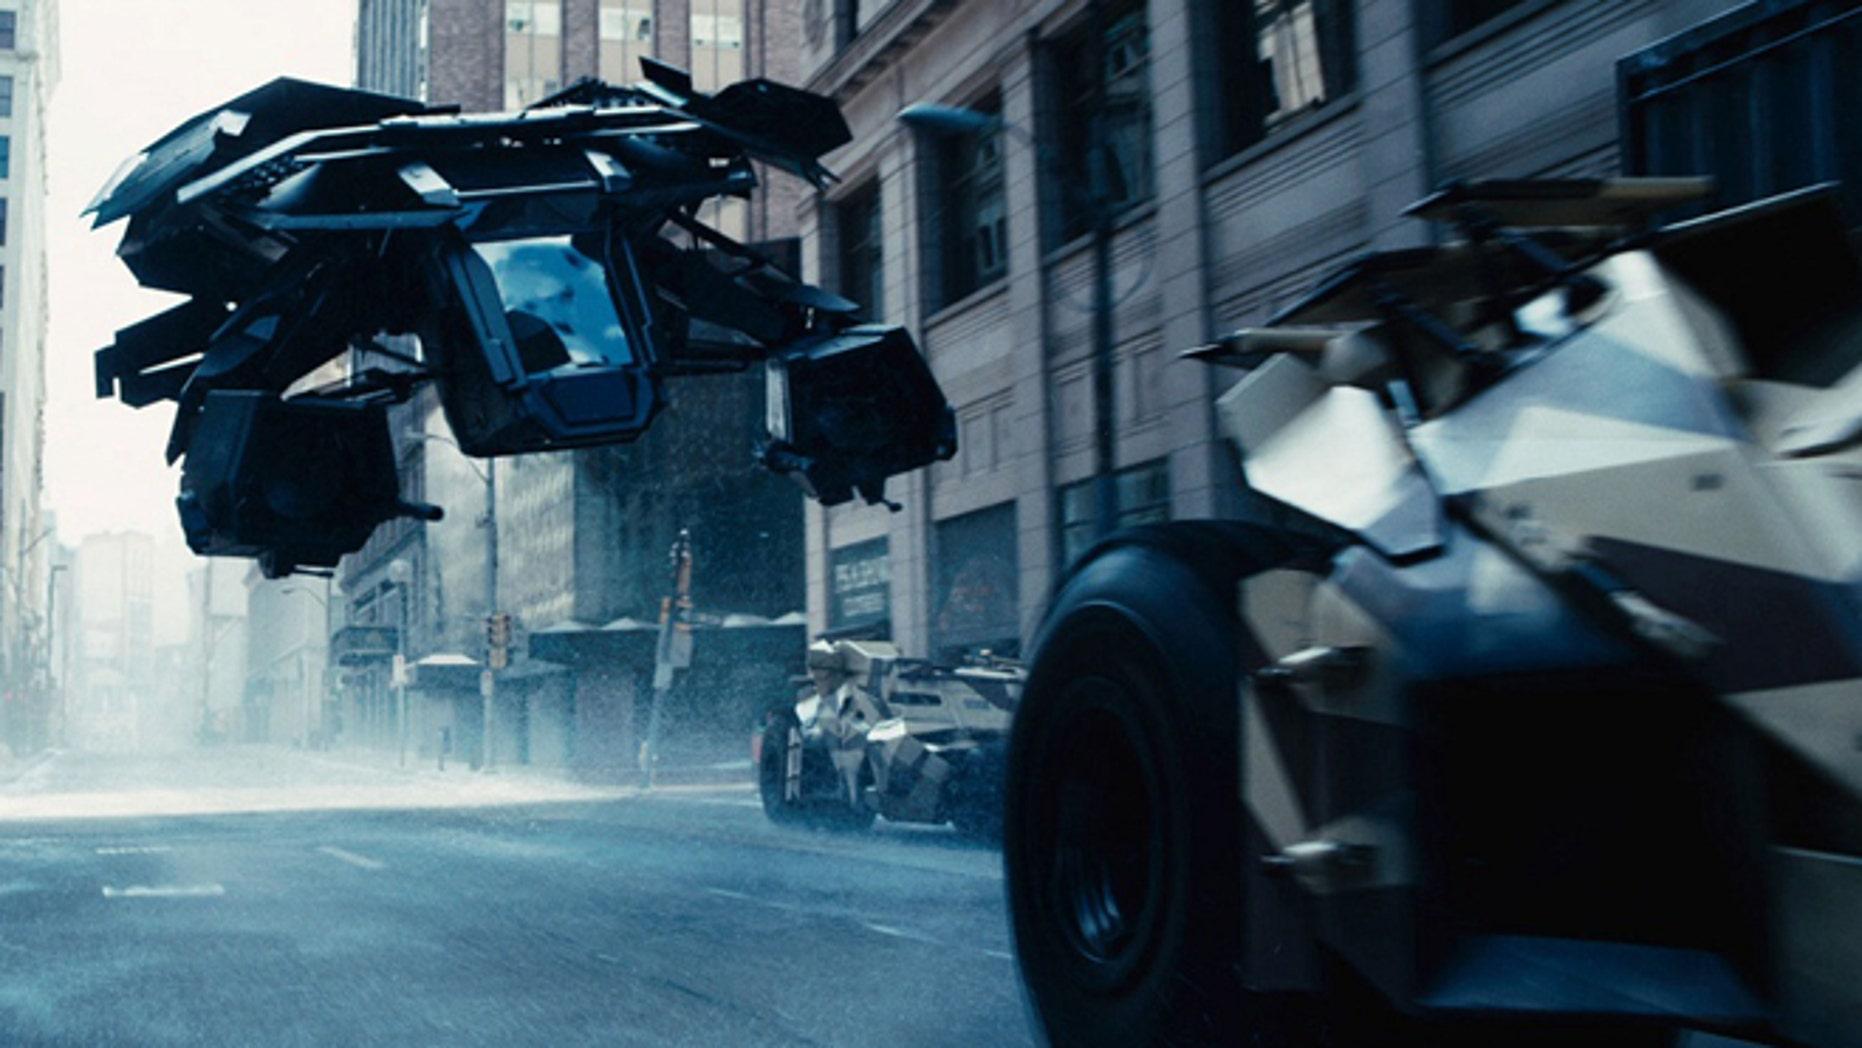 The Bat flying vehicle flies through Gotham's urban canyons in the Dark Knight Rises.